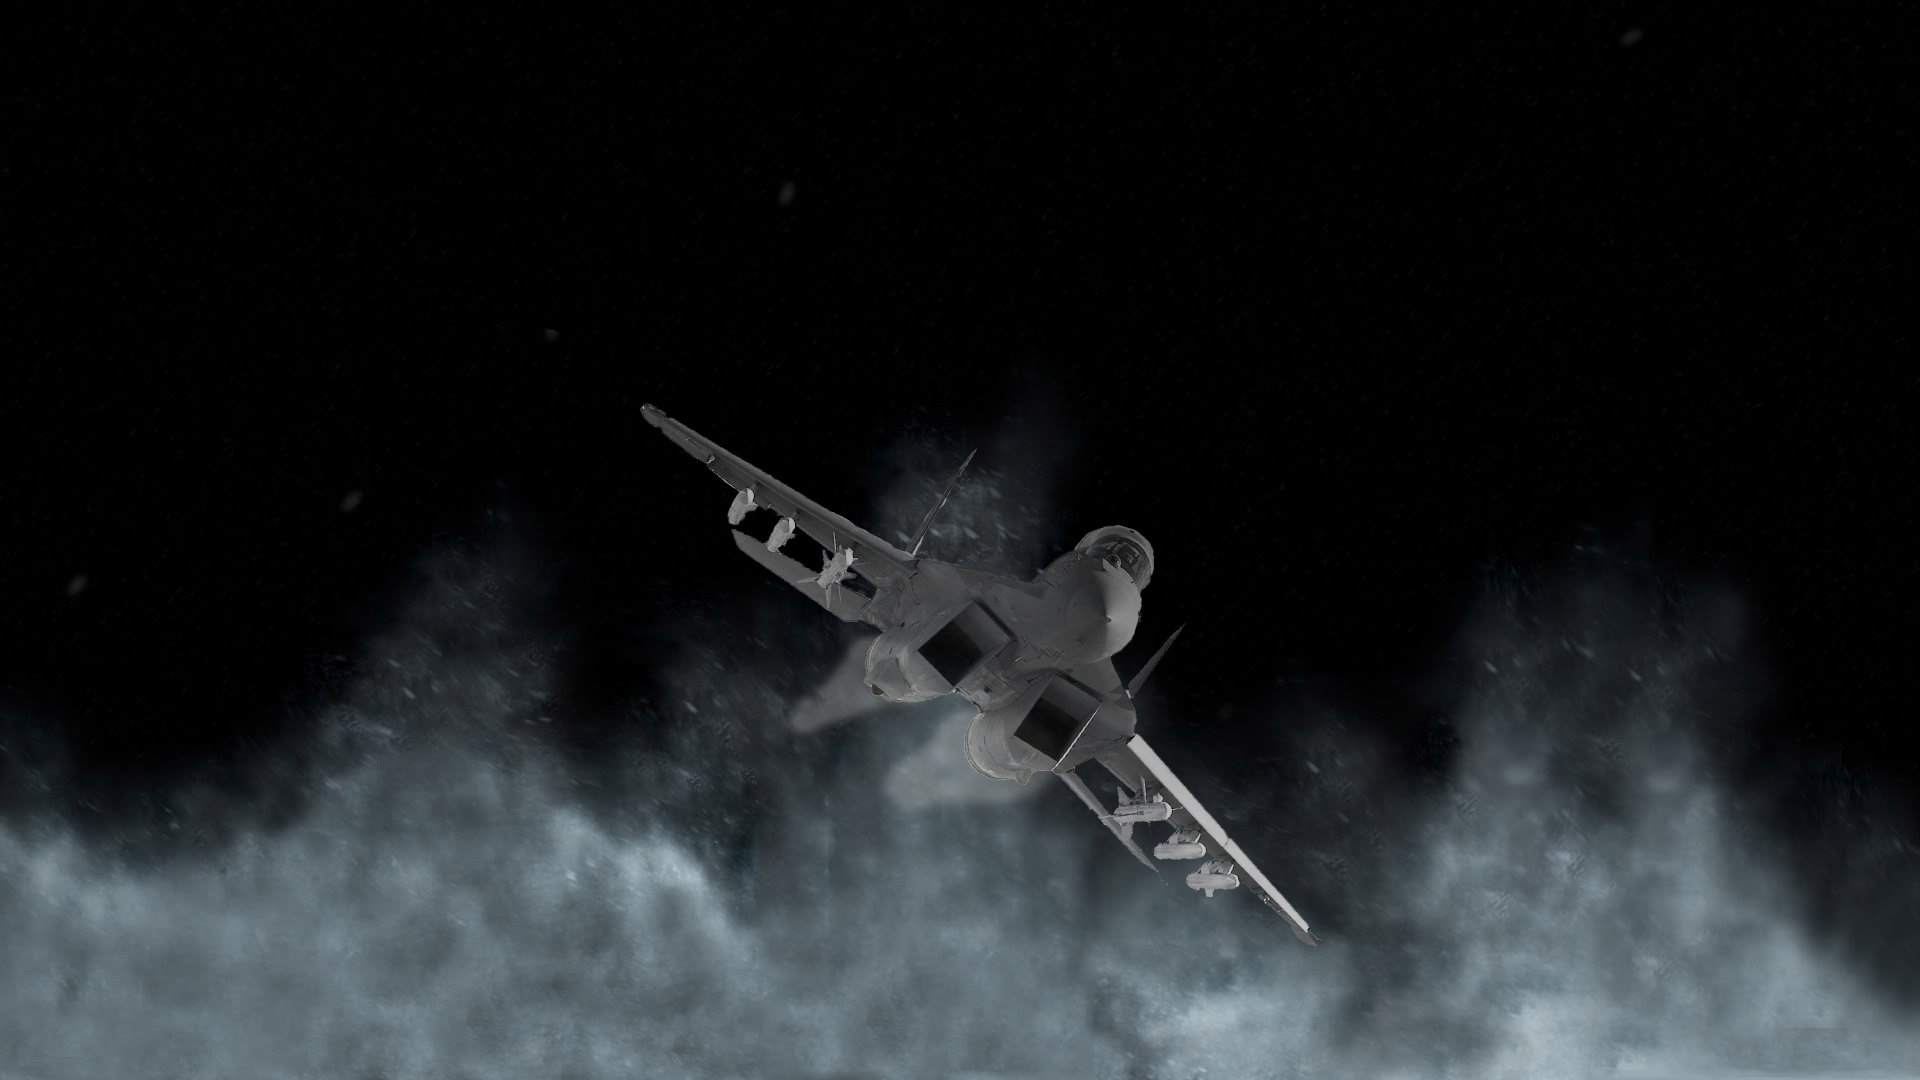 Best Lockheed Martin F 22 Raptor Wallpaper Id 446255 For High